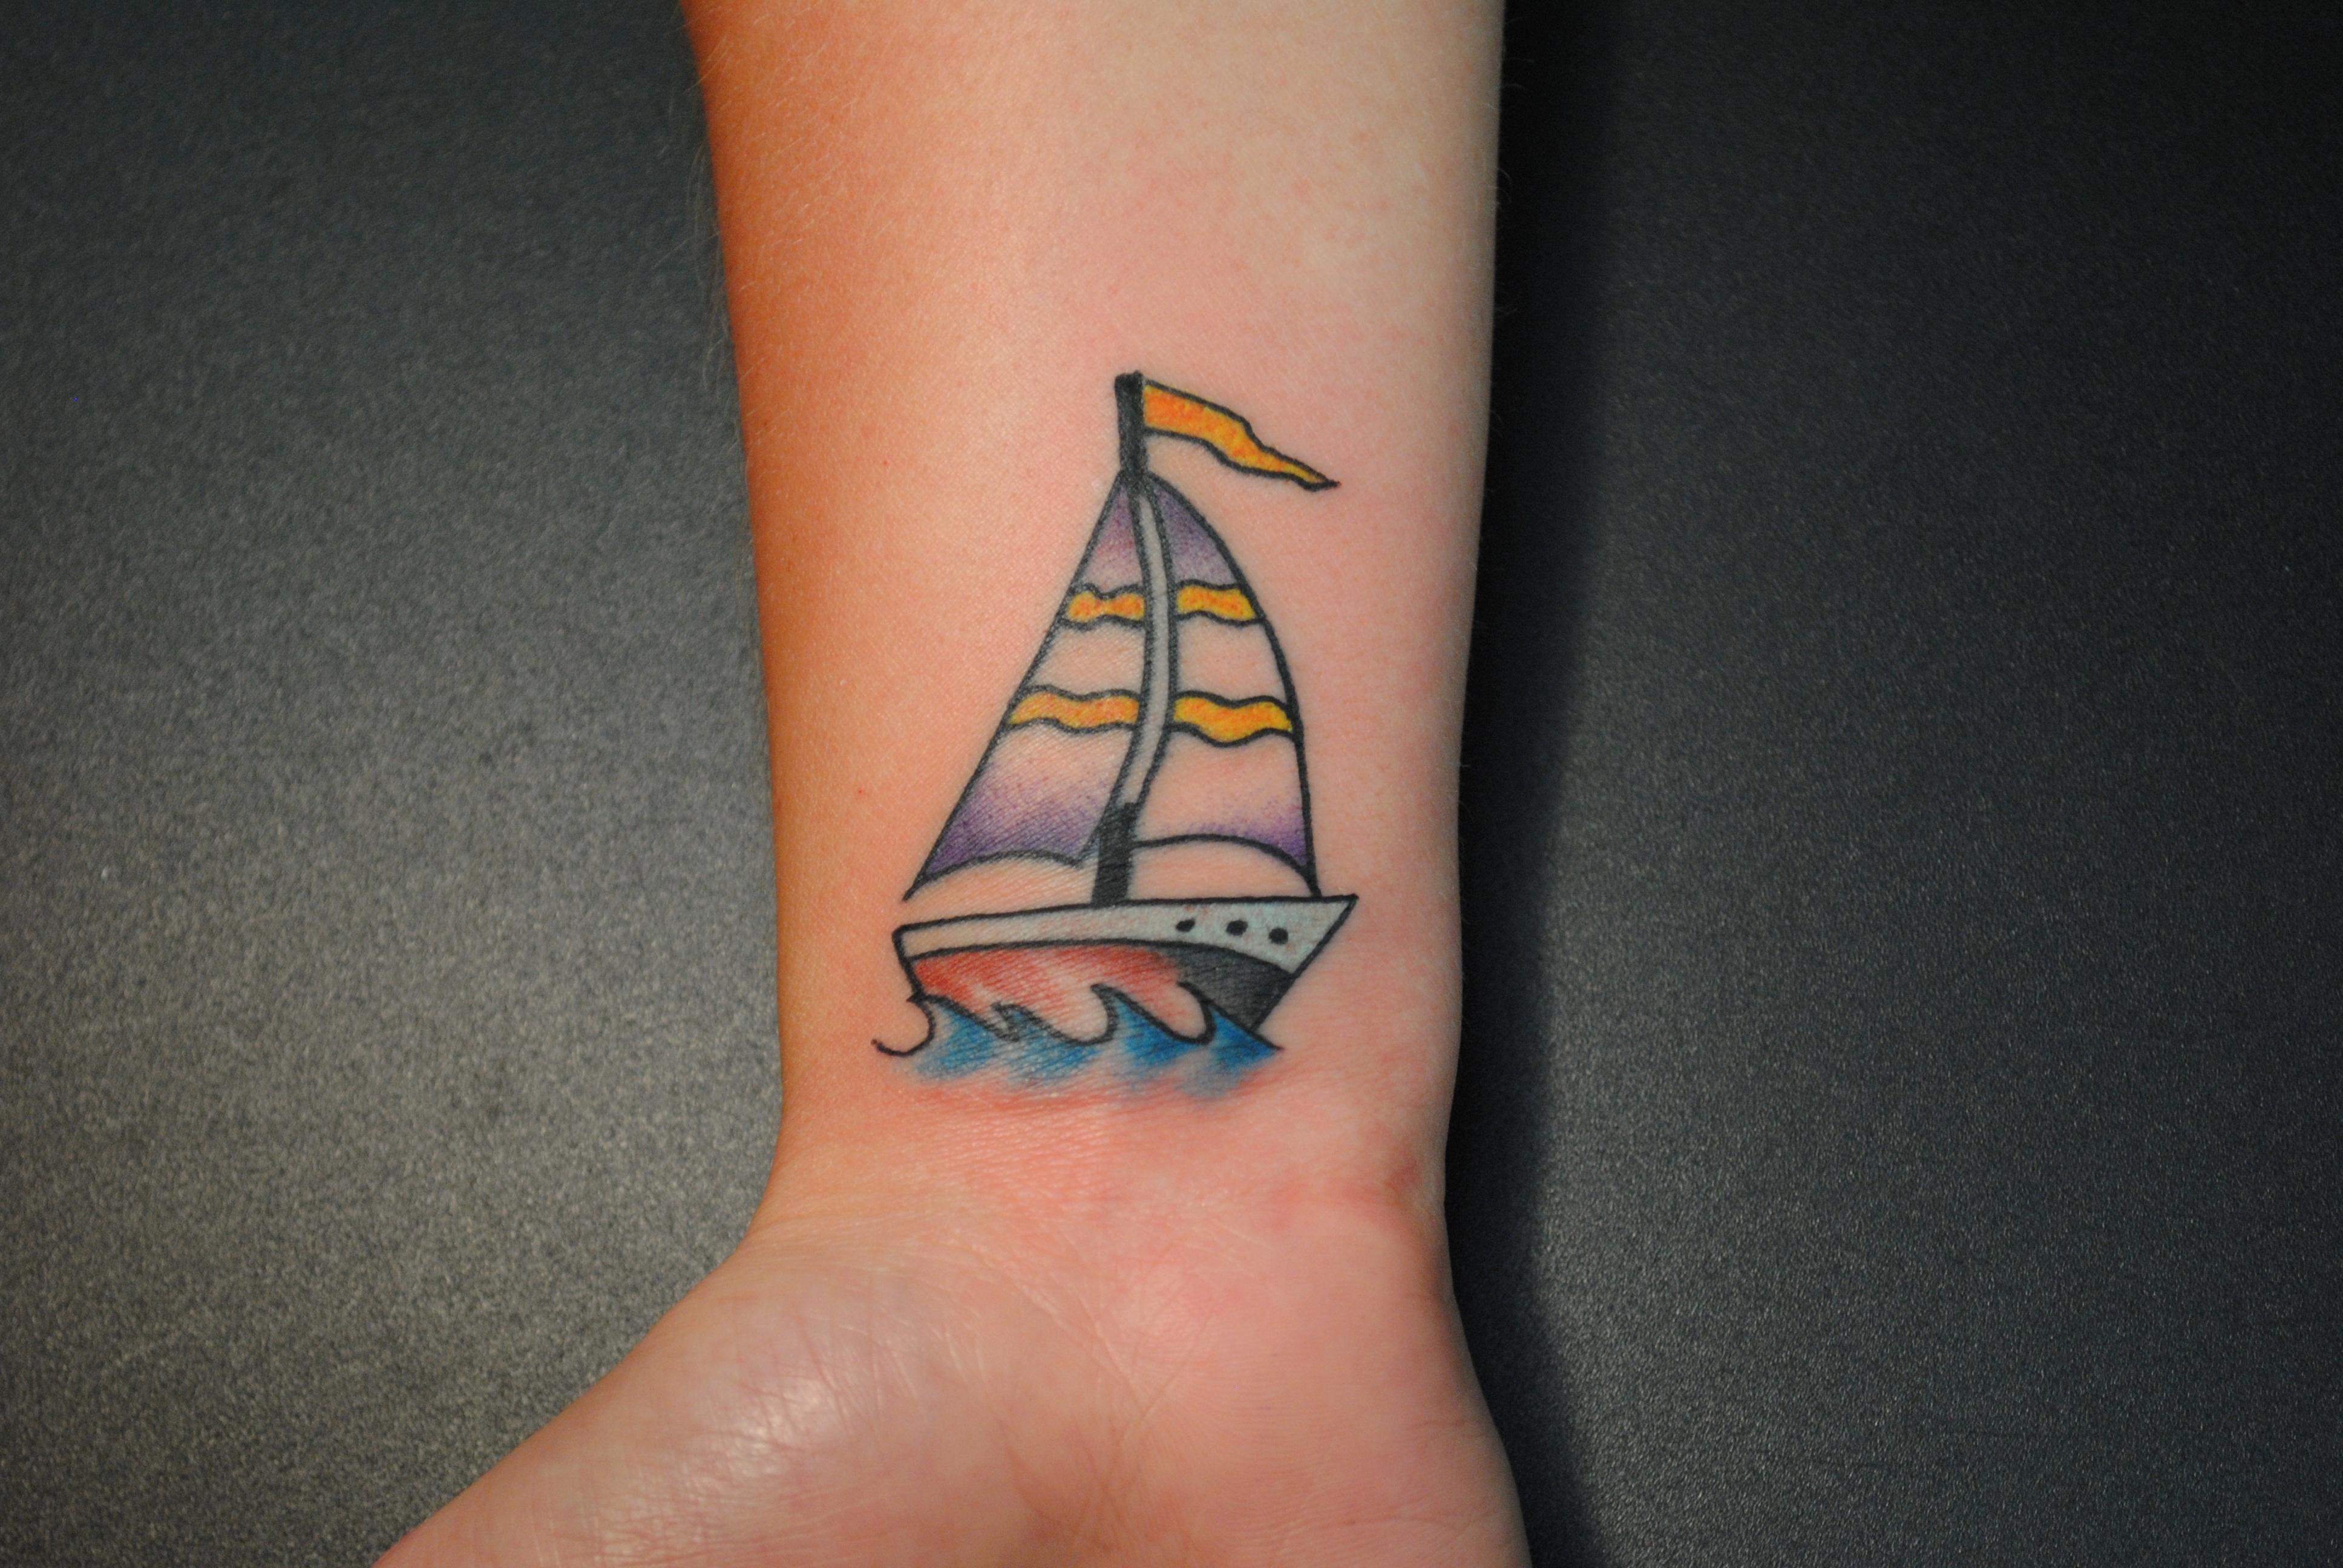 Ship Tattoo Small: Knock Knock The Devil